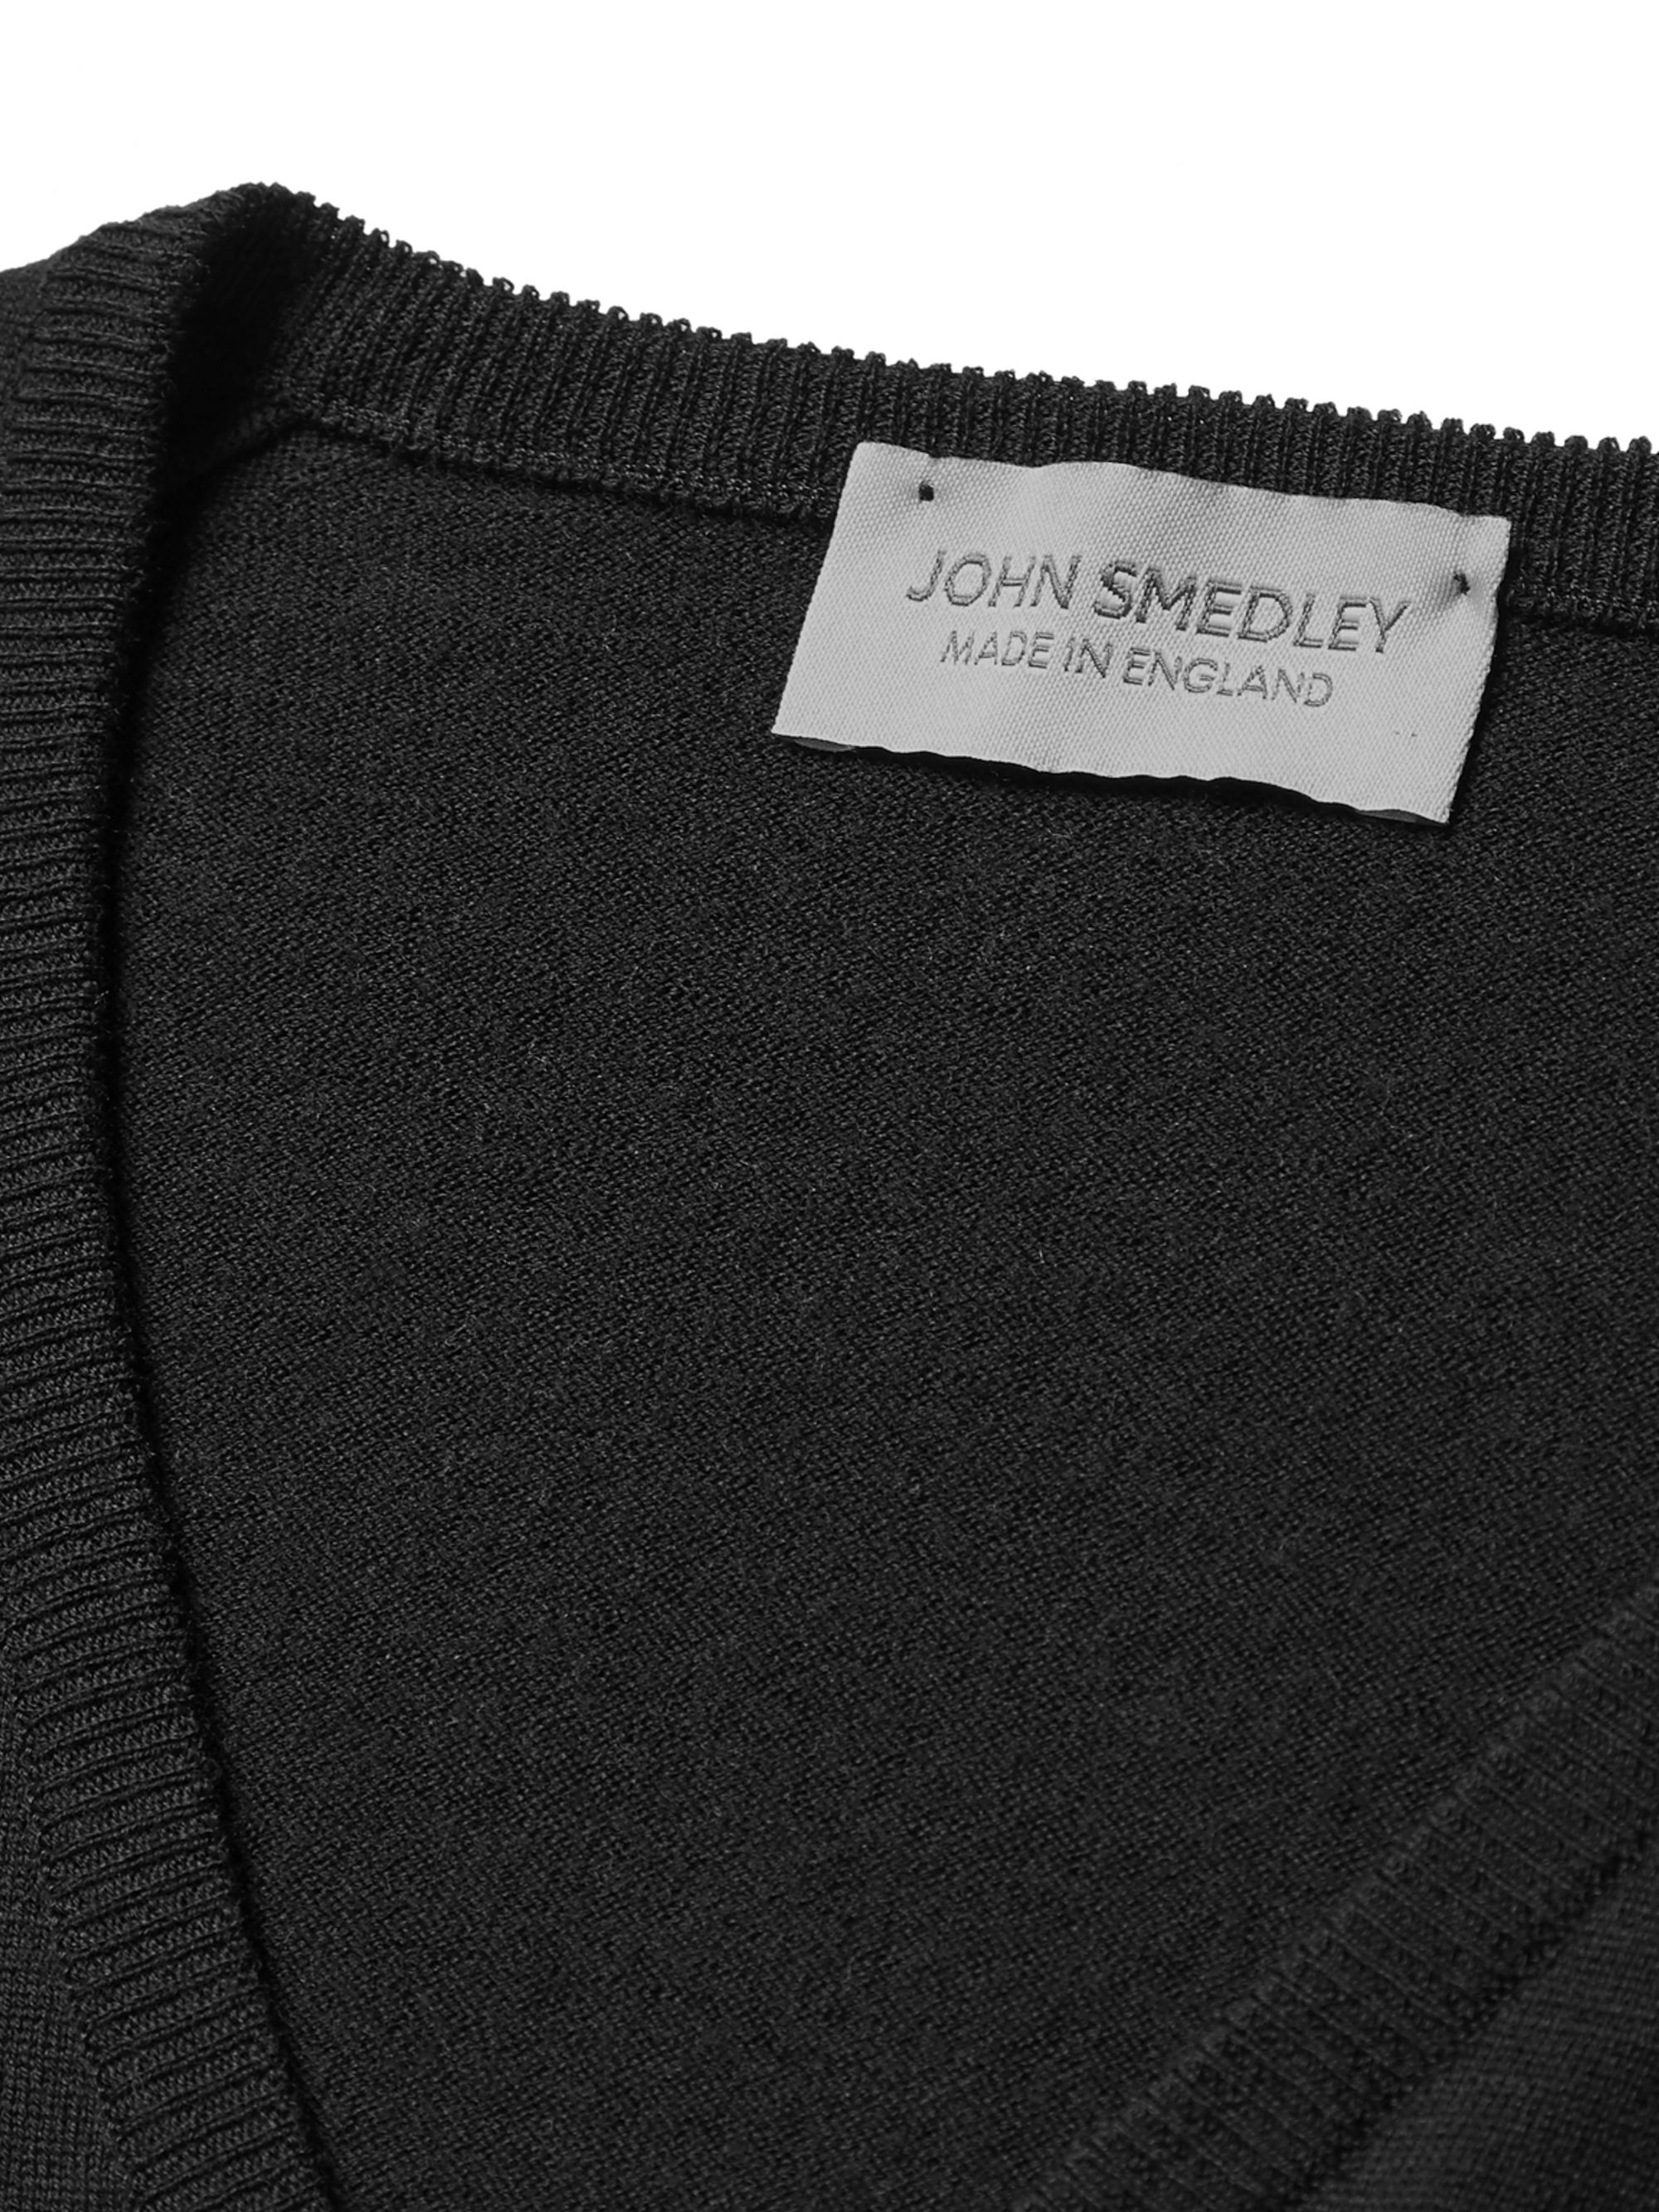 Black Blenheim Merino Wool Sweater   John Smedley